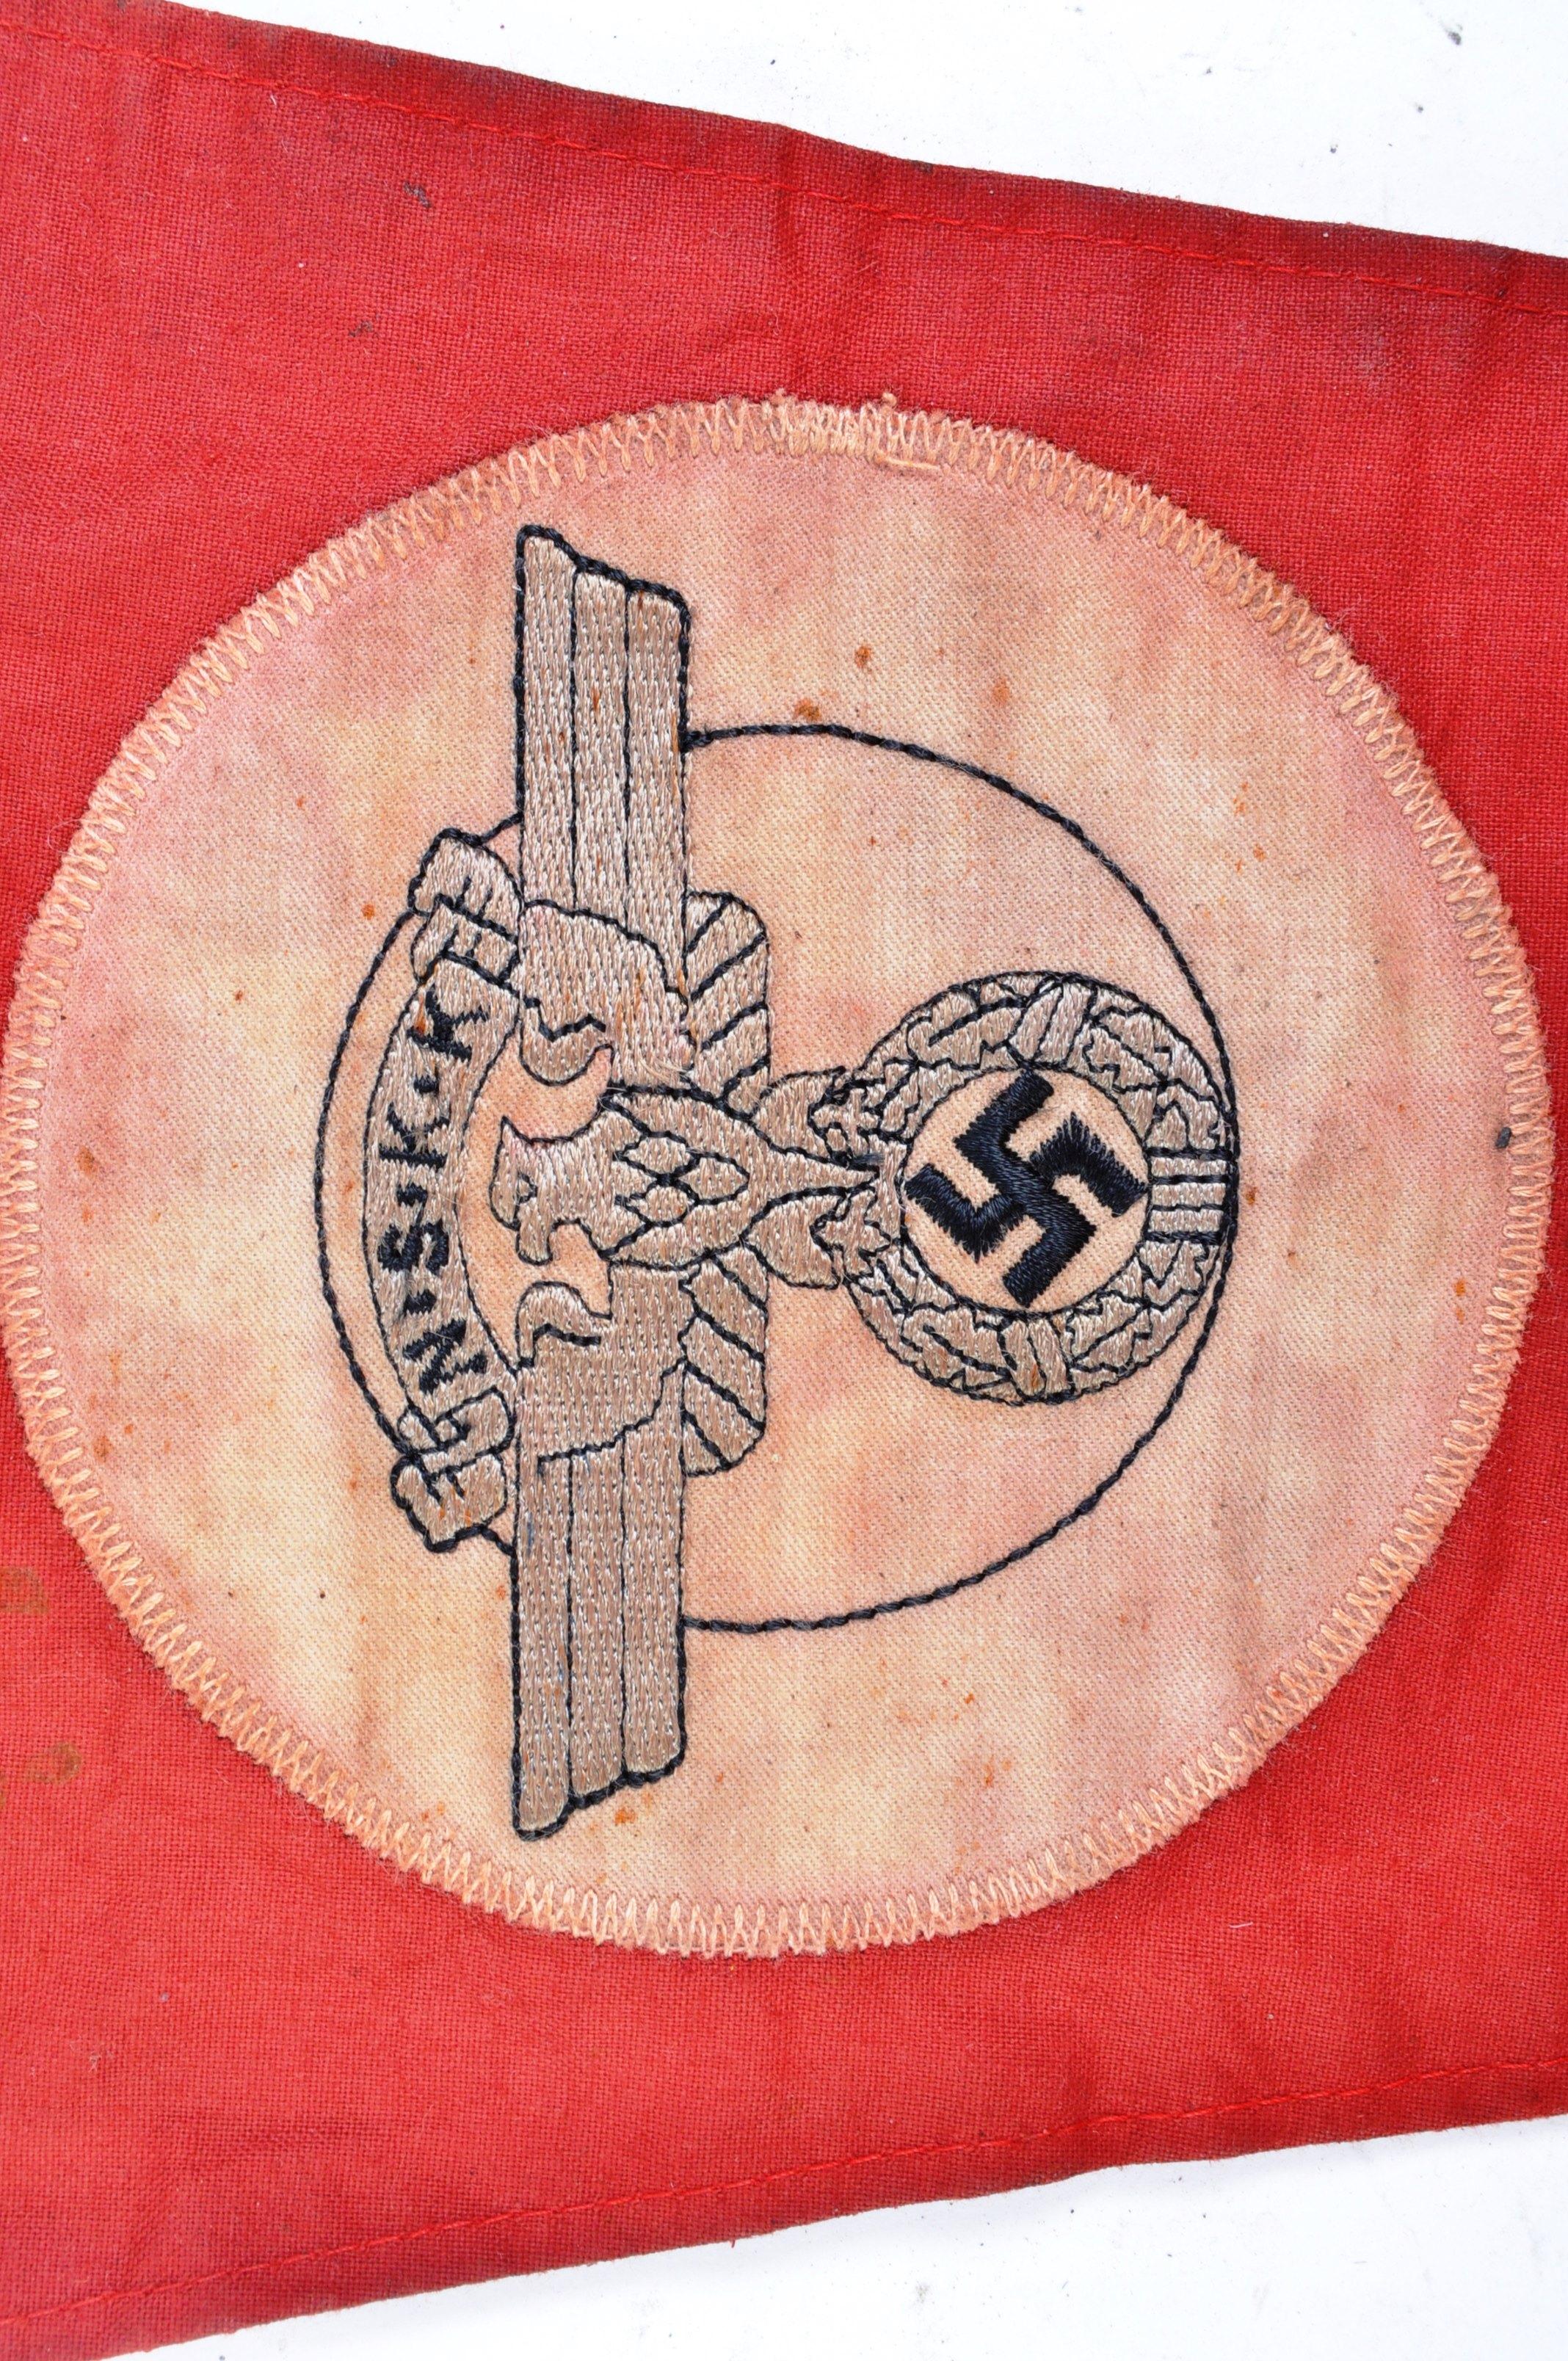 WWII SECOND WORLD WAR GERMAN THIRD REICH VEHICLE PENNANT - Image 4 of 5